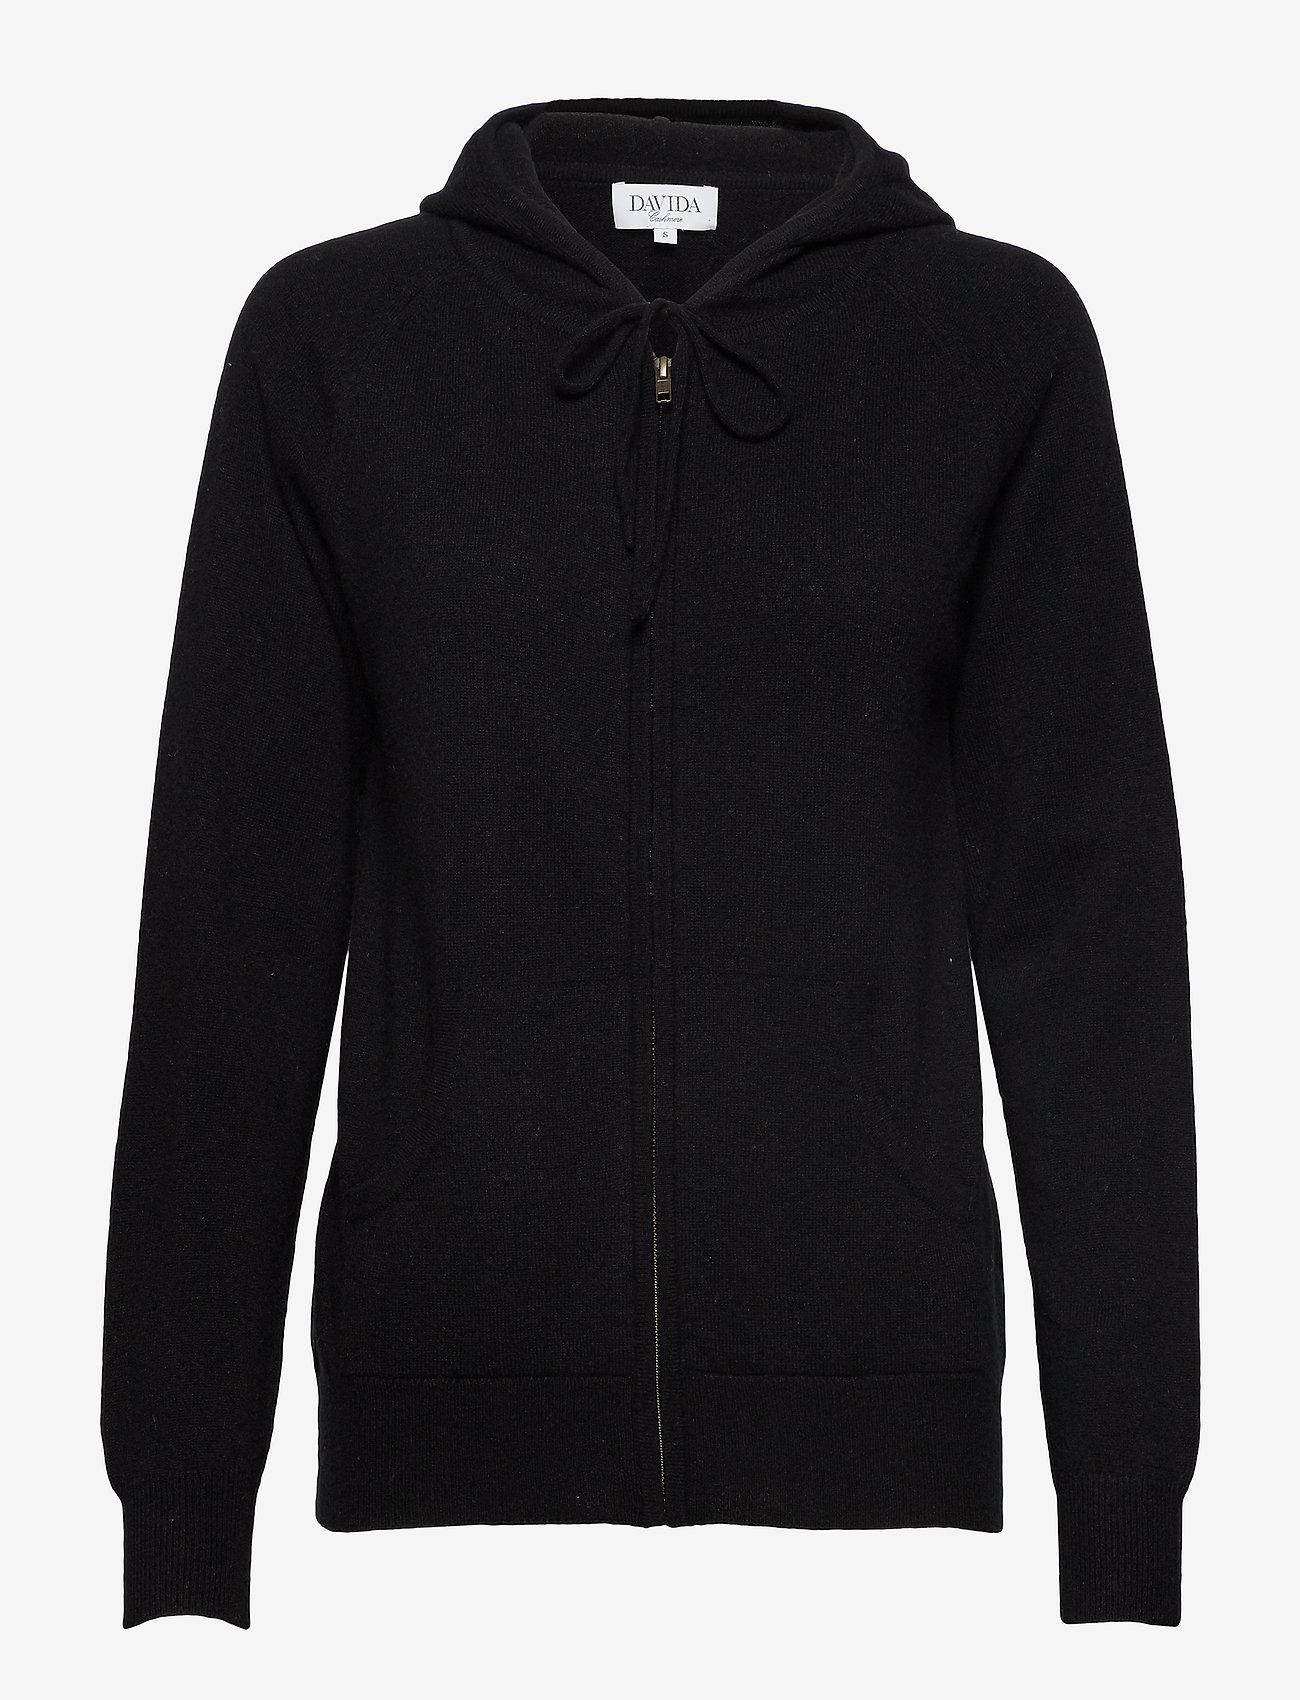 Davida Cashmere - Hoodie - sweatshirts & hoodies - black - 0